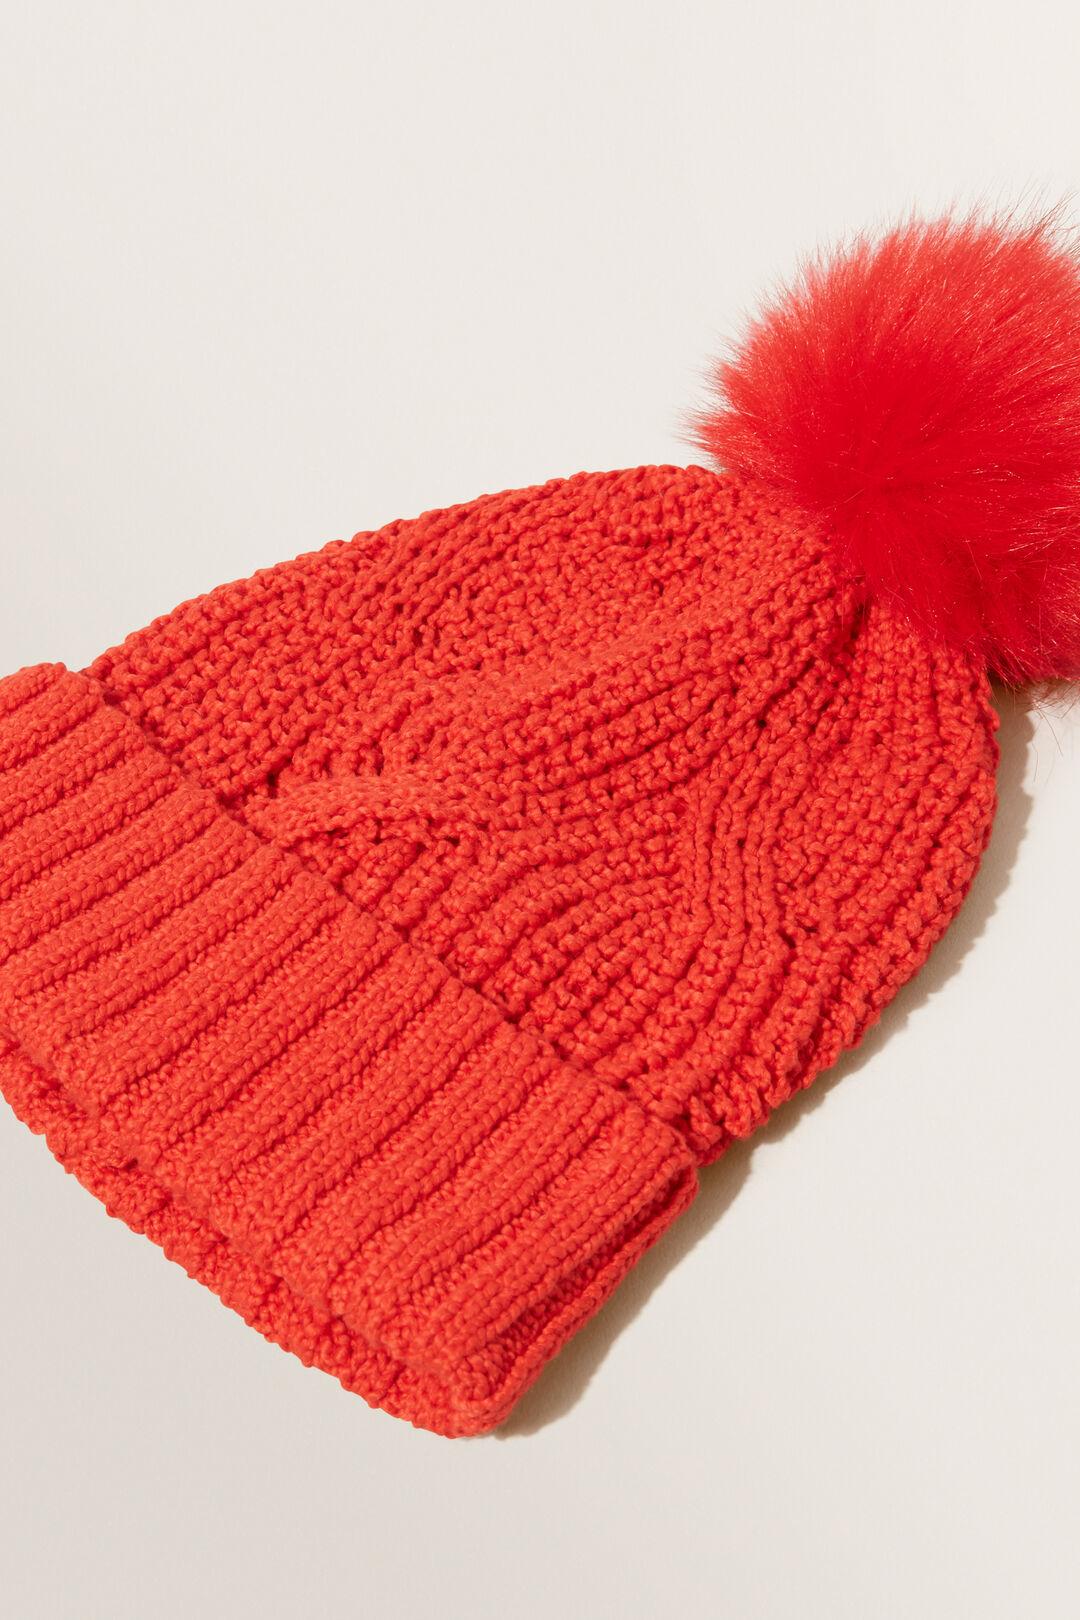 Zig Zag Knit Beanie  SCARLET RED  hi-res